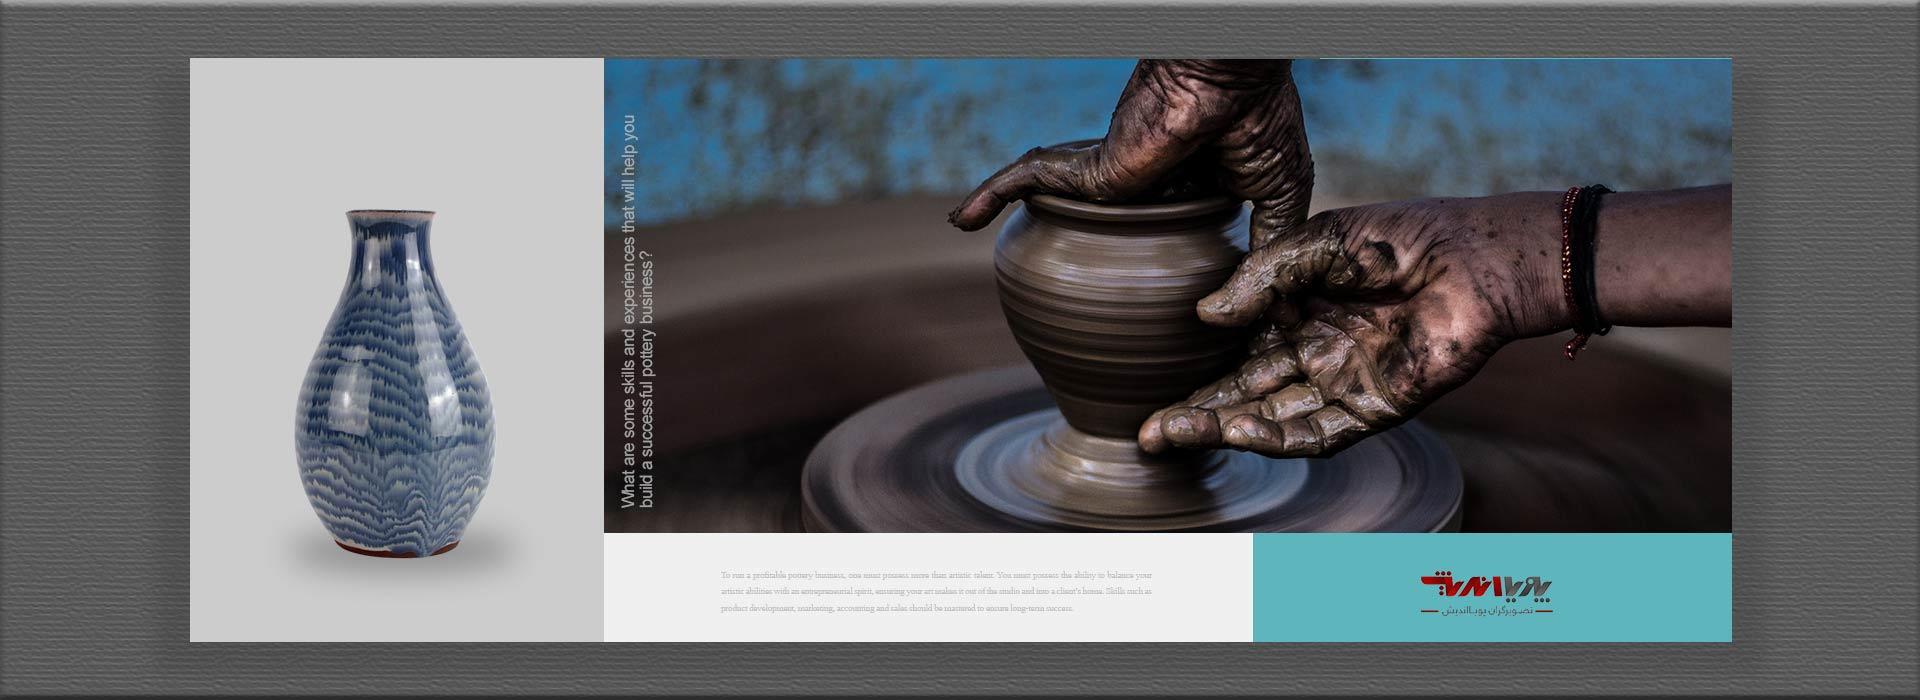 successful pottery business - چگونه کسب و کار سفالگری راه اندازی کنیم ؟